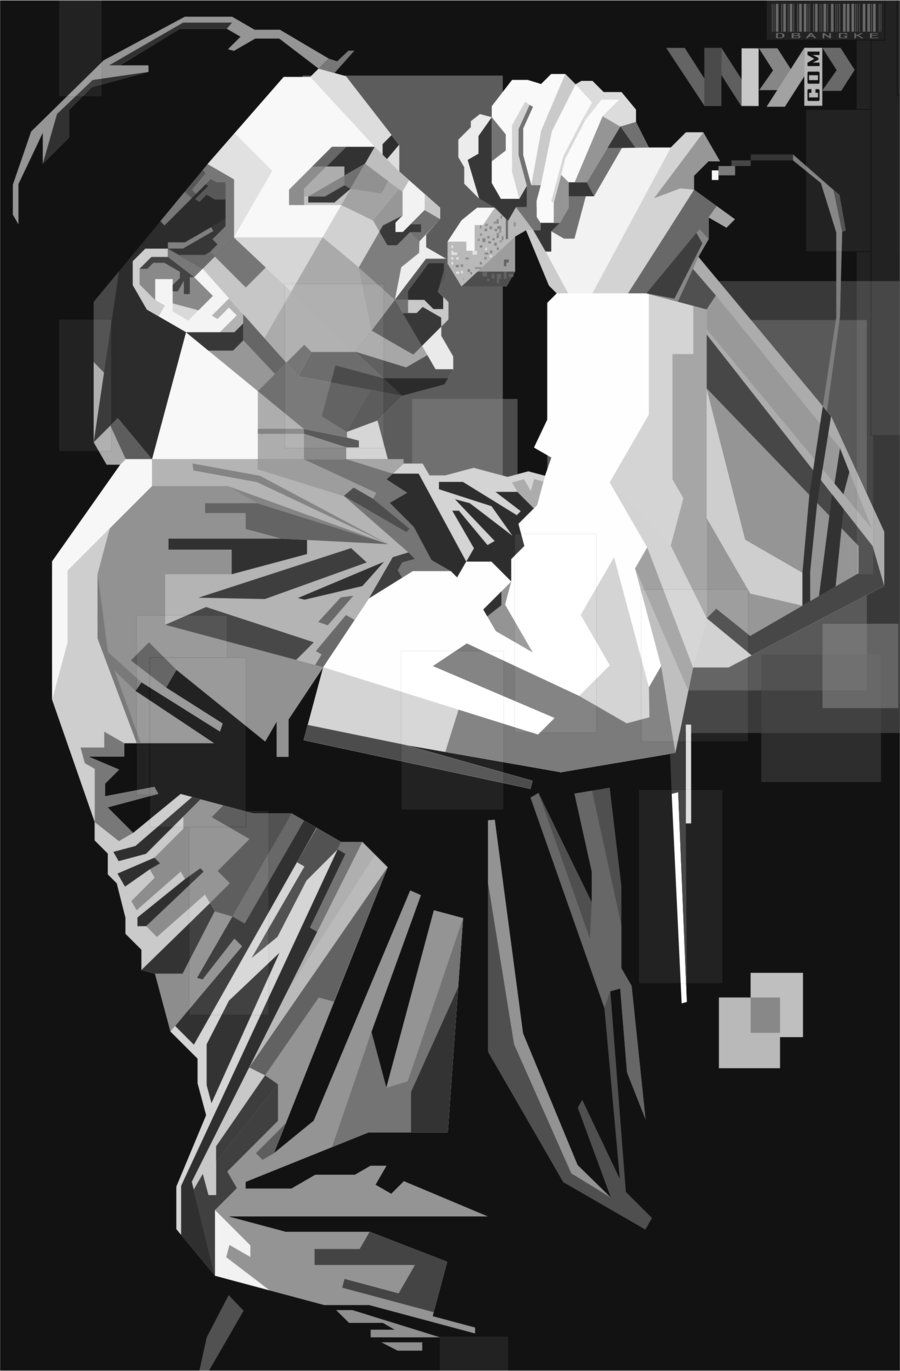 Eddie Vedder By Dbangke D5ajov9 Jpg 900 1371 Retratos Arte Pop Carteles De Rock Arte Pop